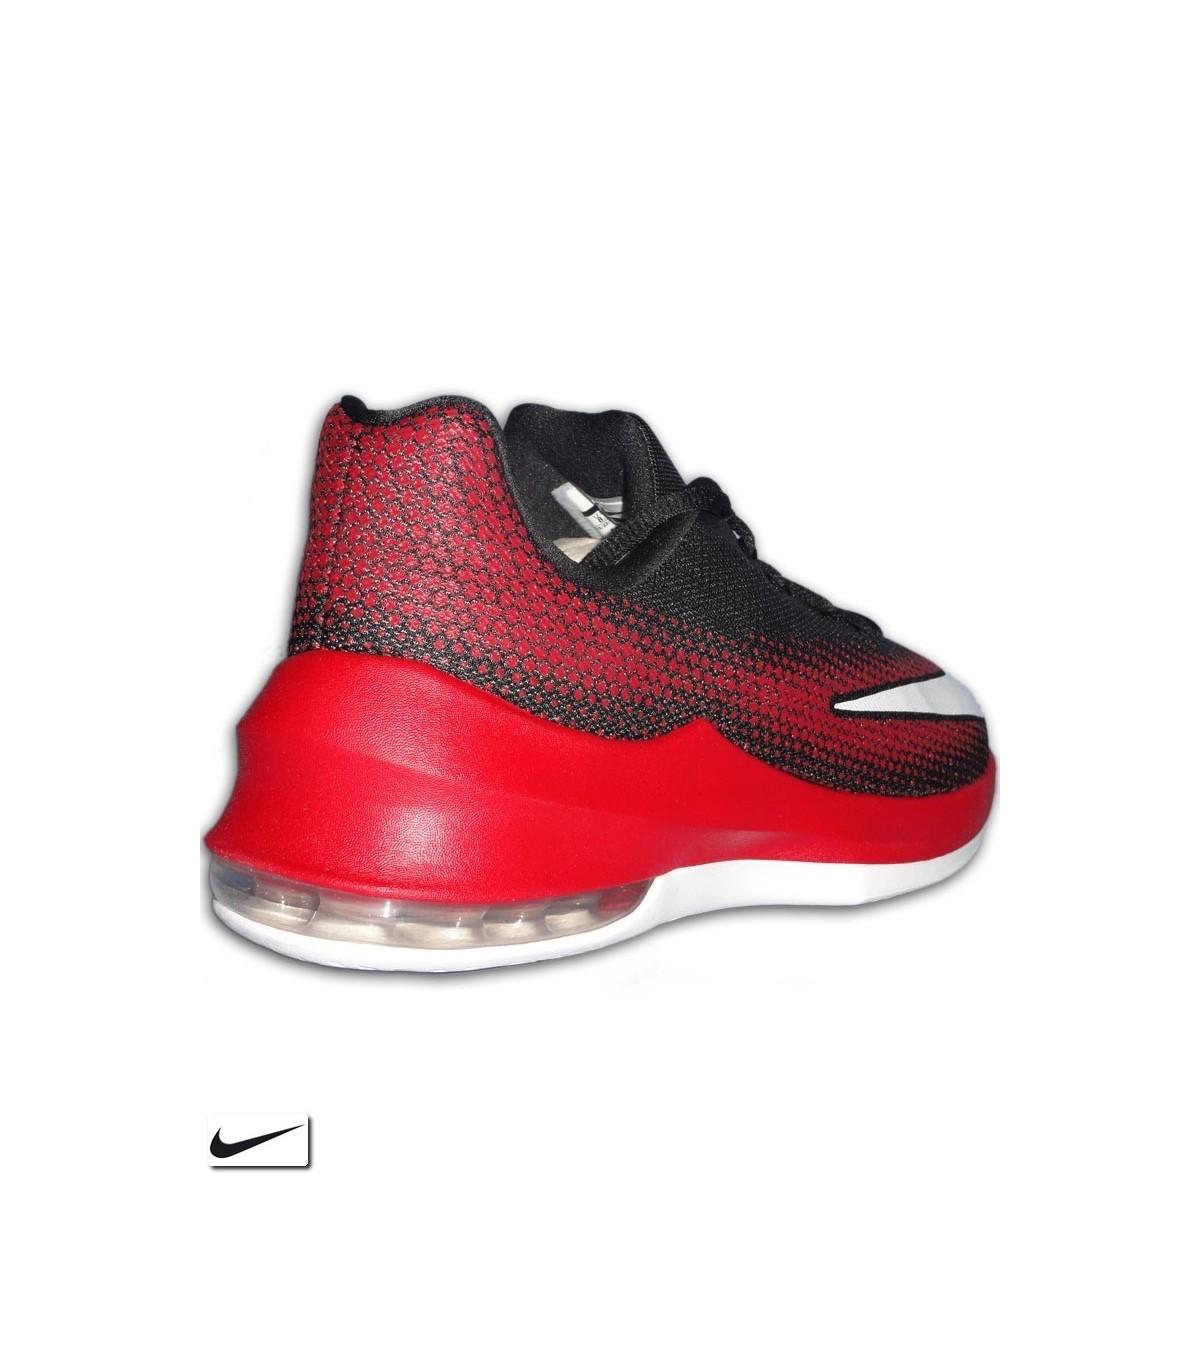 4803631e4d1 Bota Baloncesto NIKE AIR MAX INFURIATE LOW Negro-Rojo 852457-006 Hombre  basket. Bota Baloncesto NIKE AIR MAX INFURIATE ...